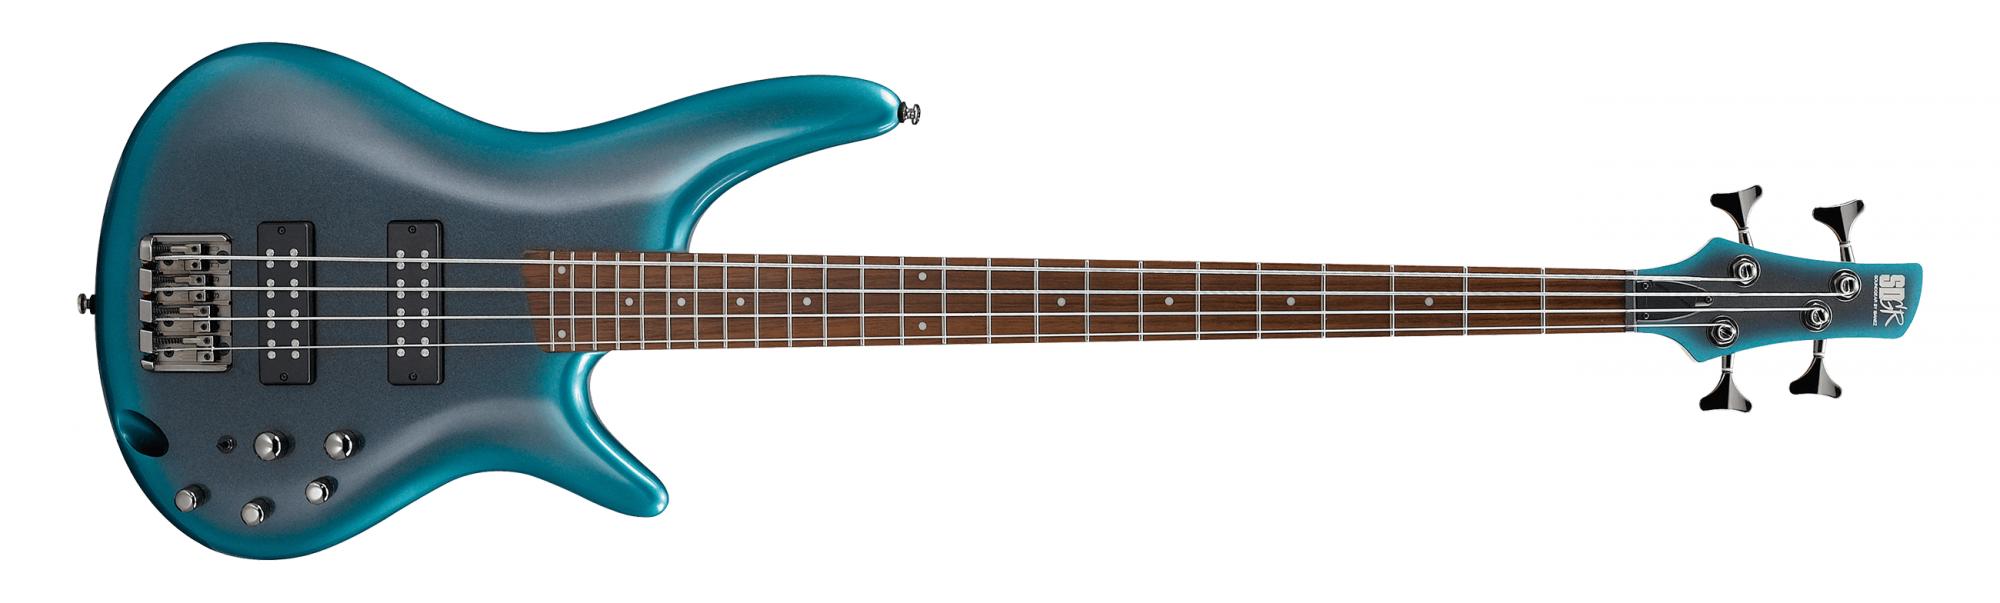 Ibanez SR300E Electric Bass, Cerulean Aura Burst